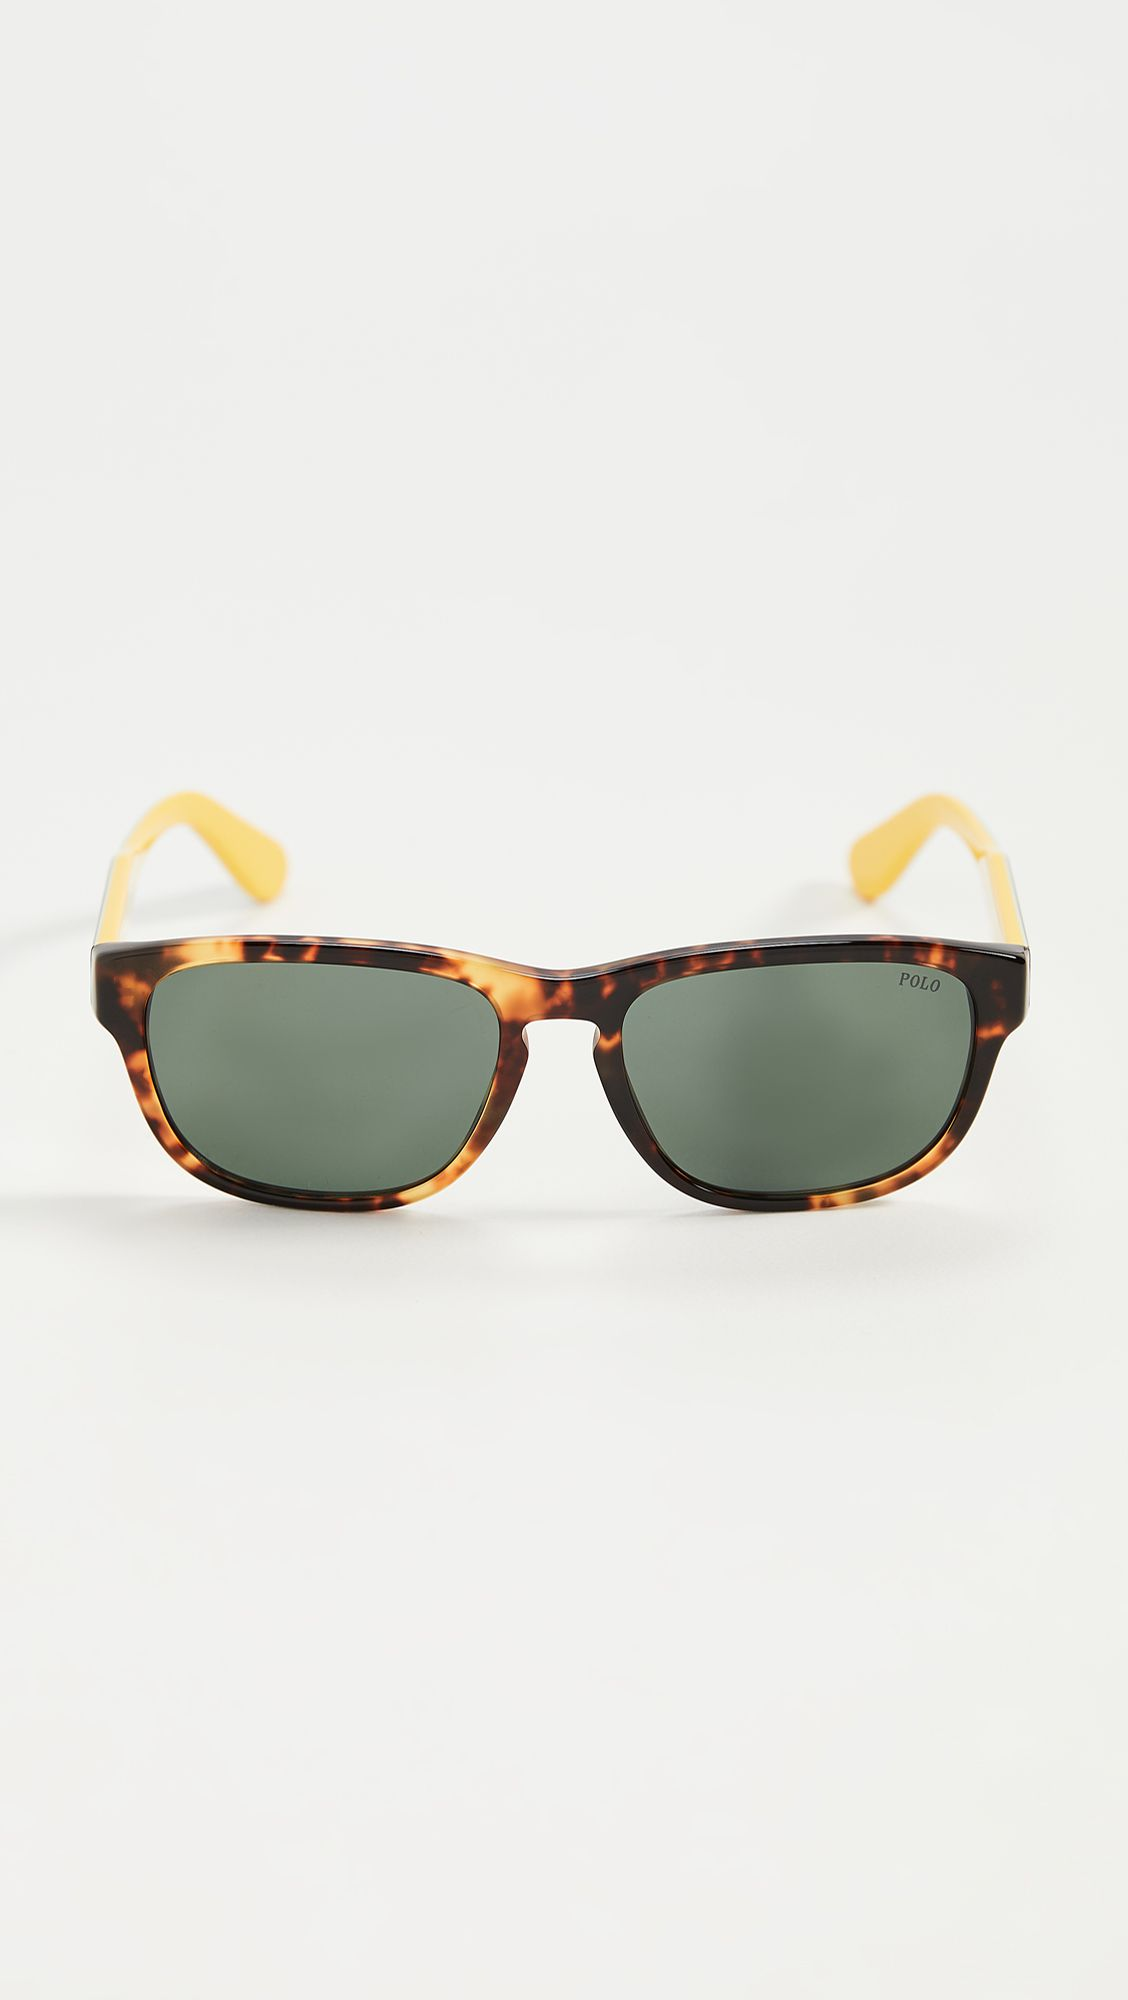 Óculos de Sol Masculino Polo Ralph Lauren PH4158 Havana